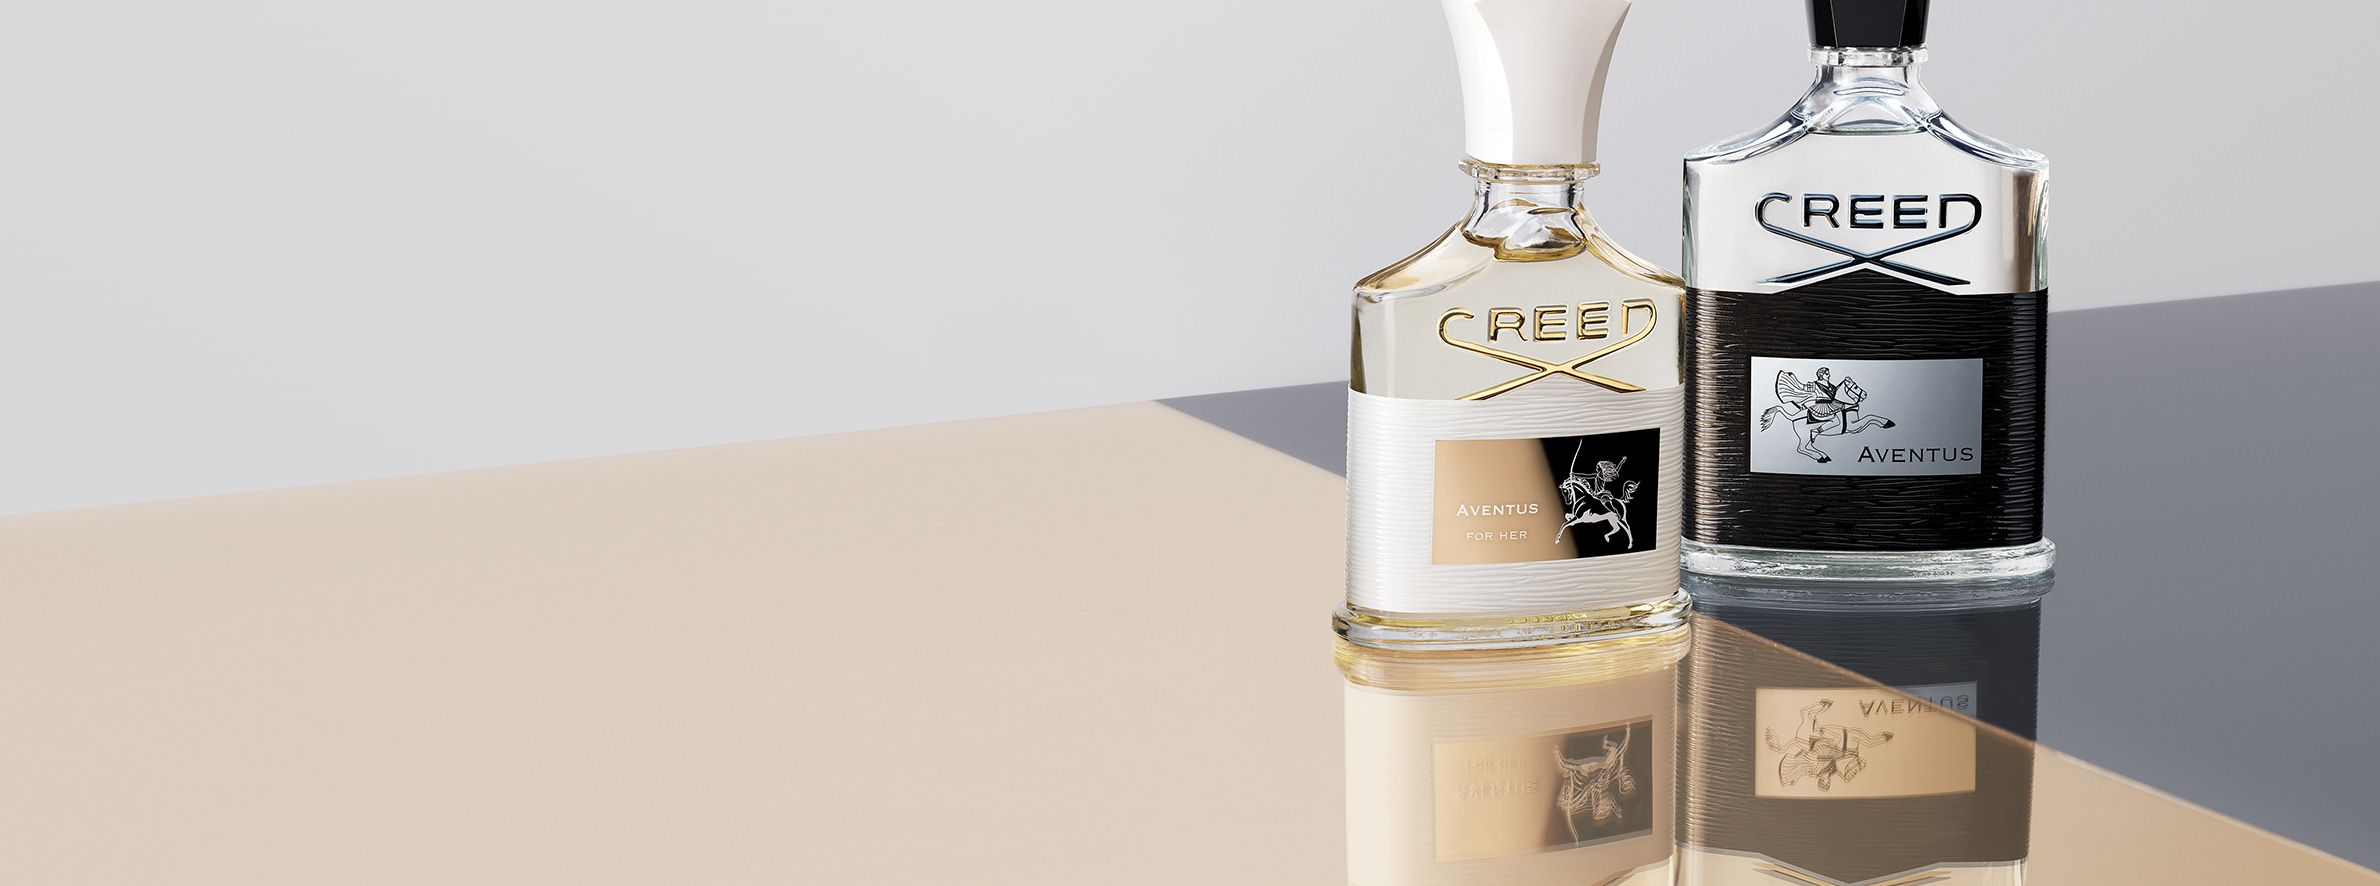 Creed John Lewis Partners